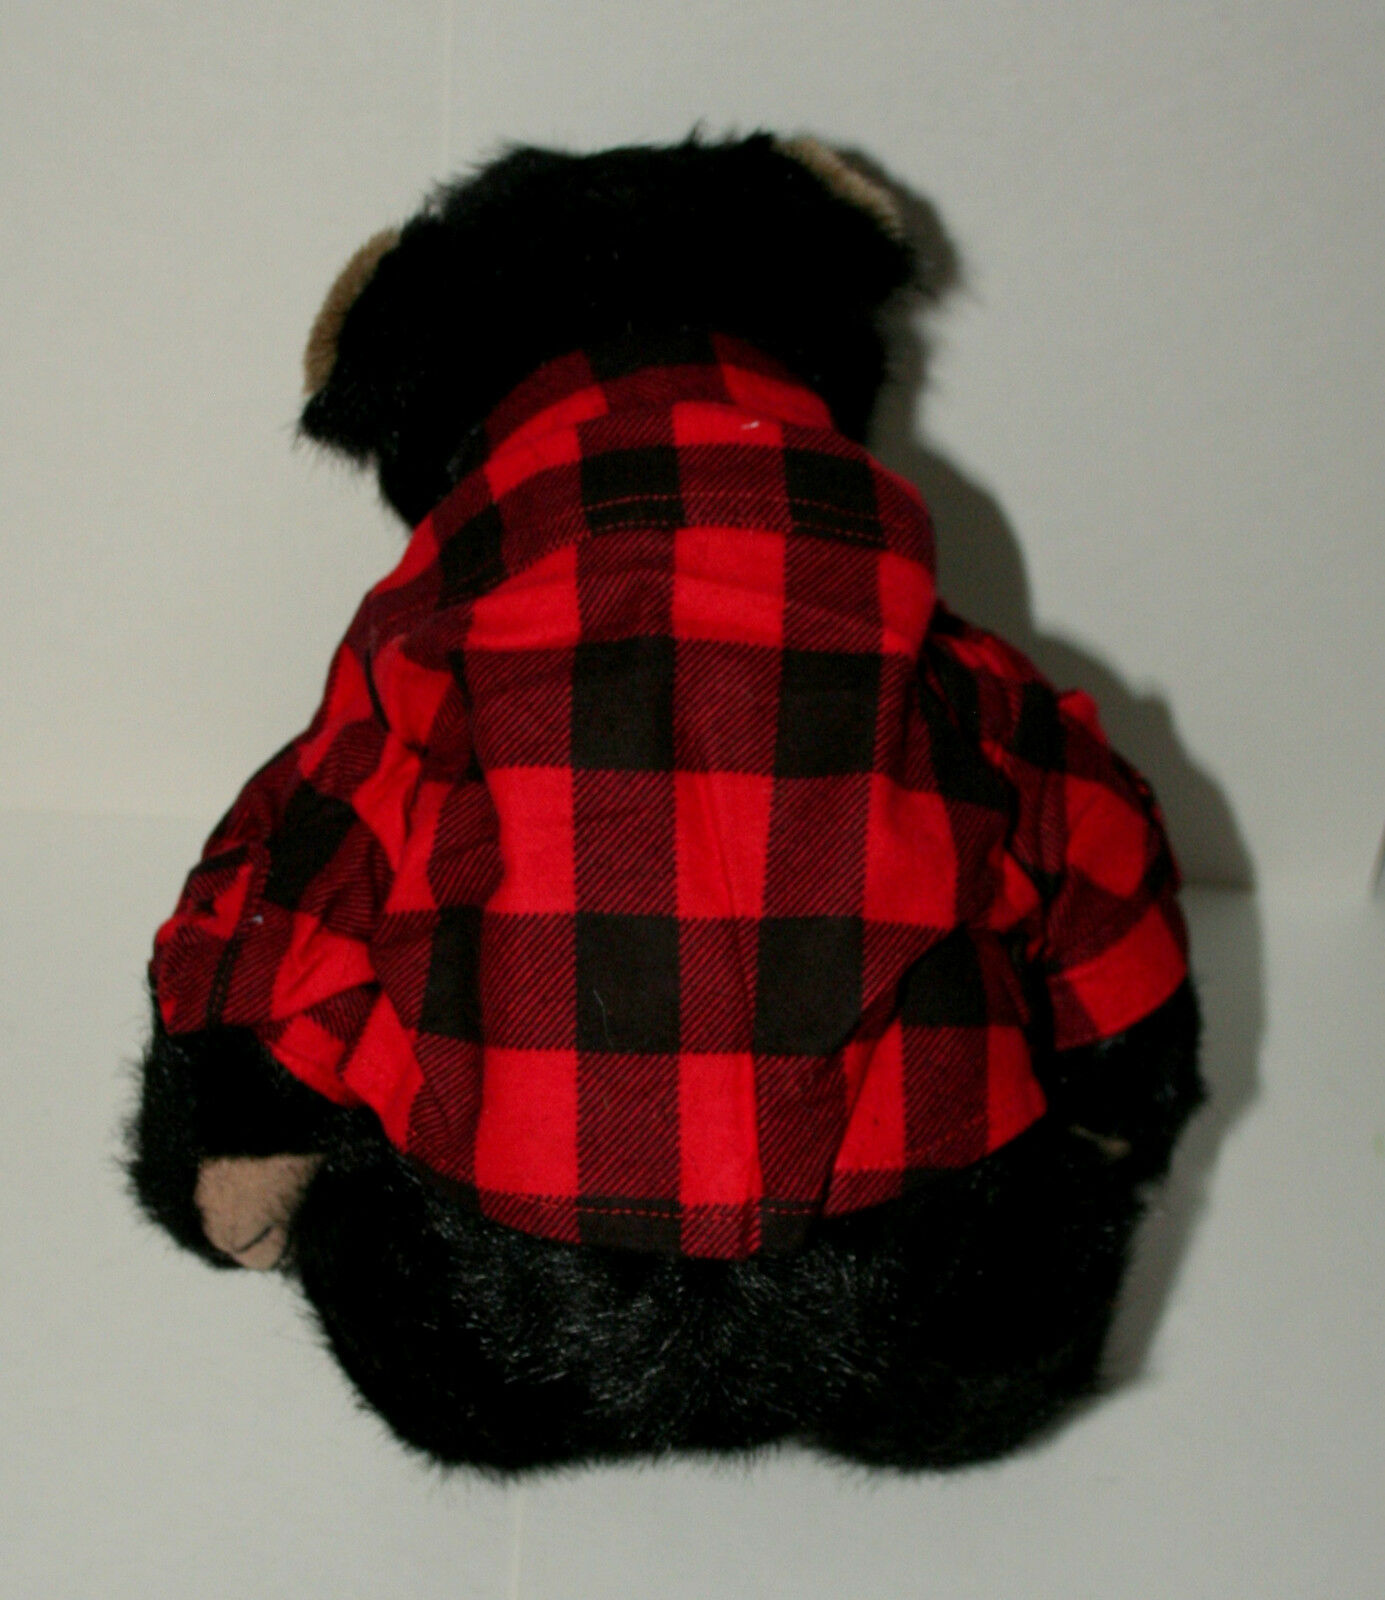 Boyds Pa (Father) Bear Bear Bear Teddy Plush 14  New in bag Tags NOS 2004 Plaid Shirt 118760